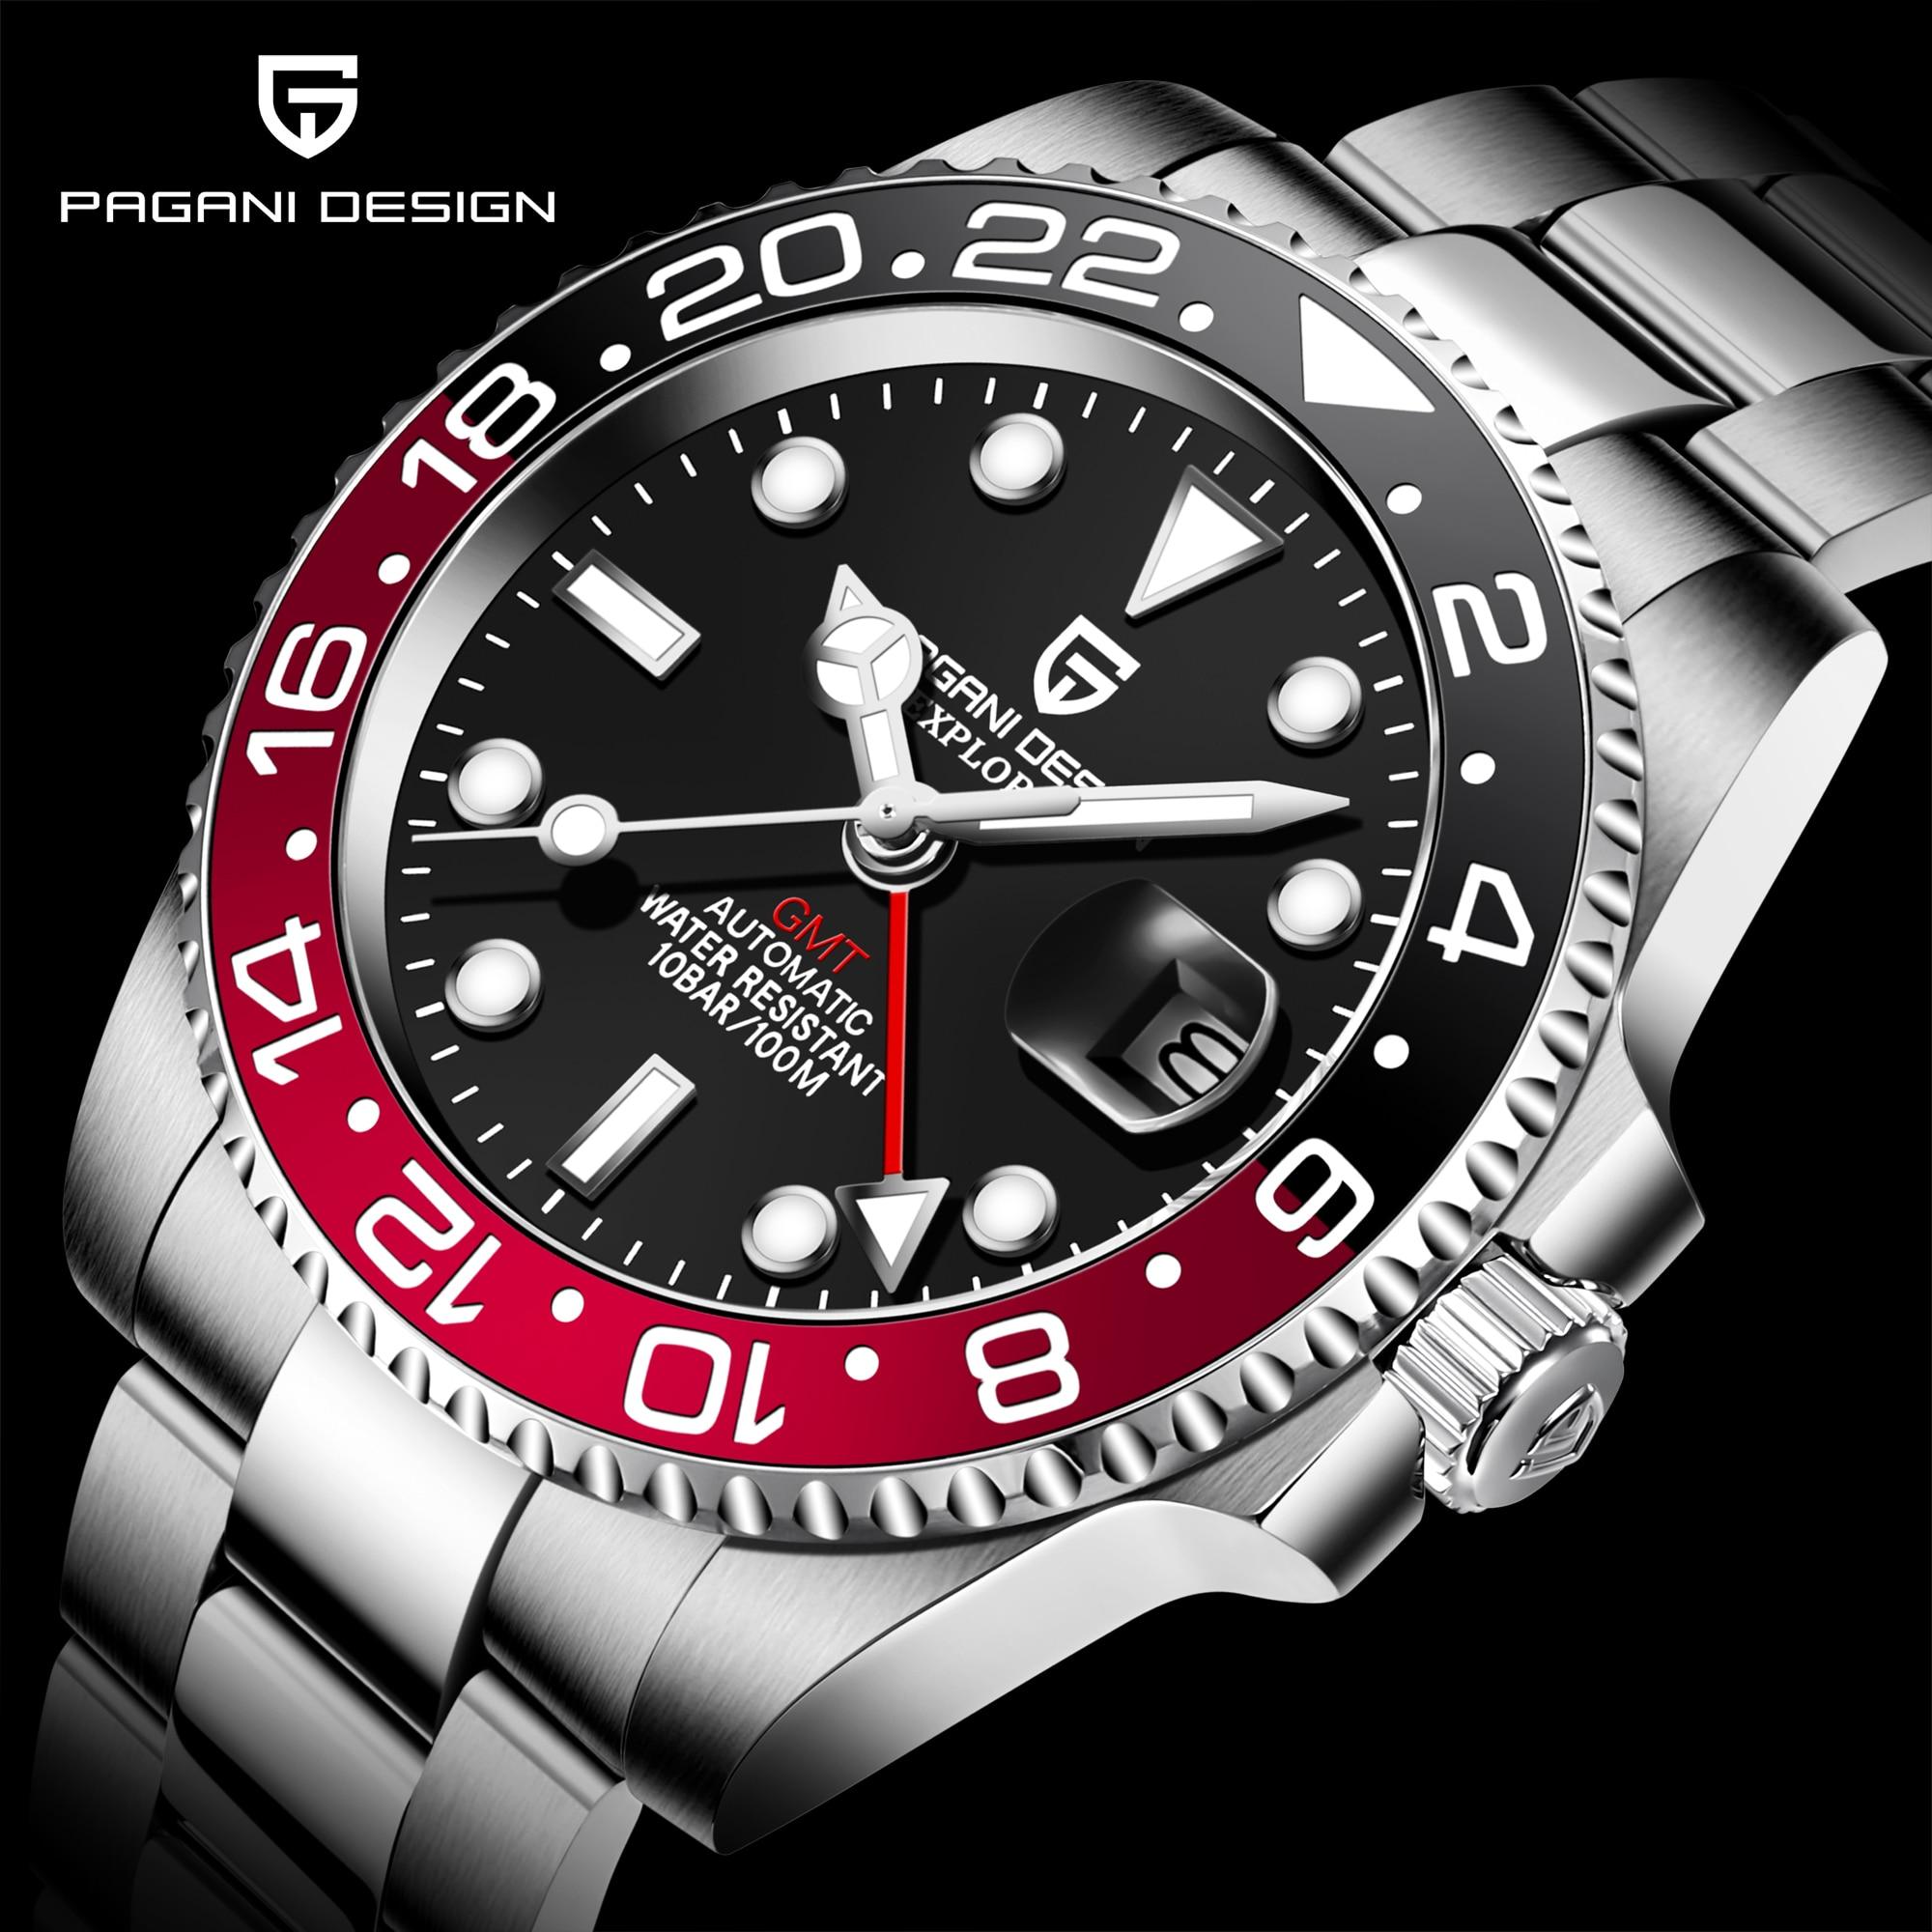 PAGANI DESIGN Top Brand Sapphire GMT Watch Stainless Steel Men Automatic Watch Waterproof Sports Mechanical Watch Reloj Hombre